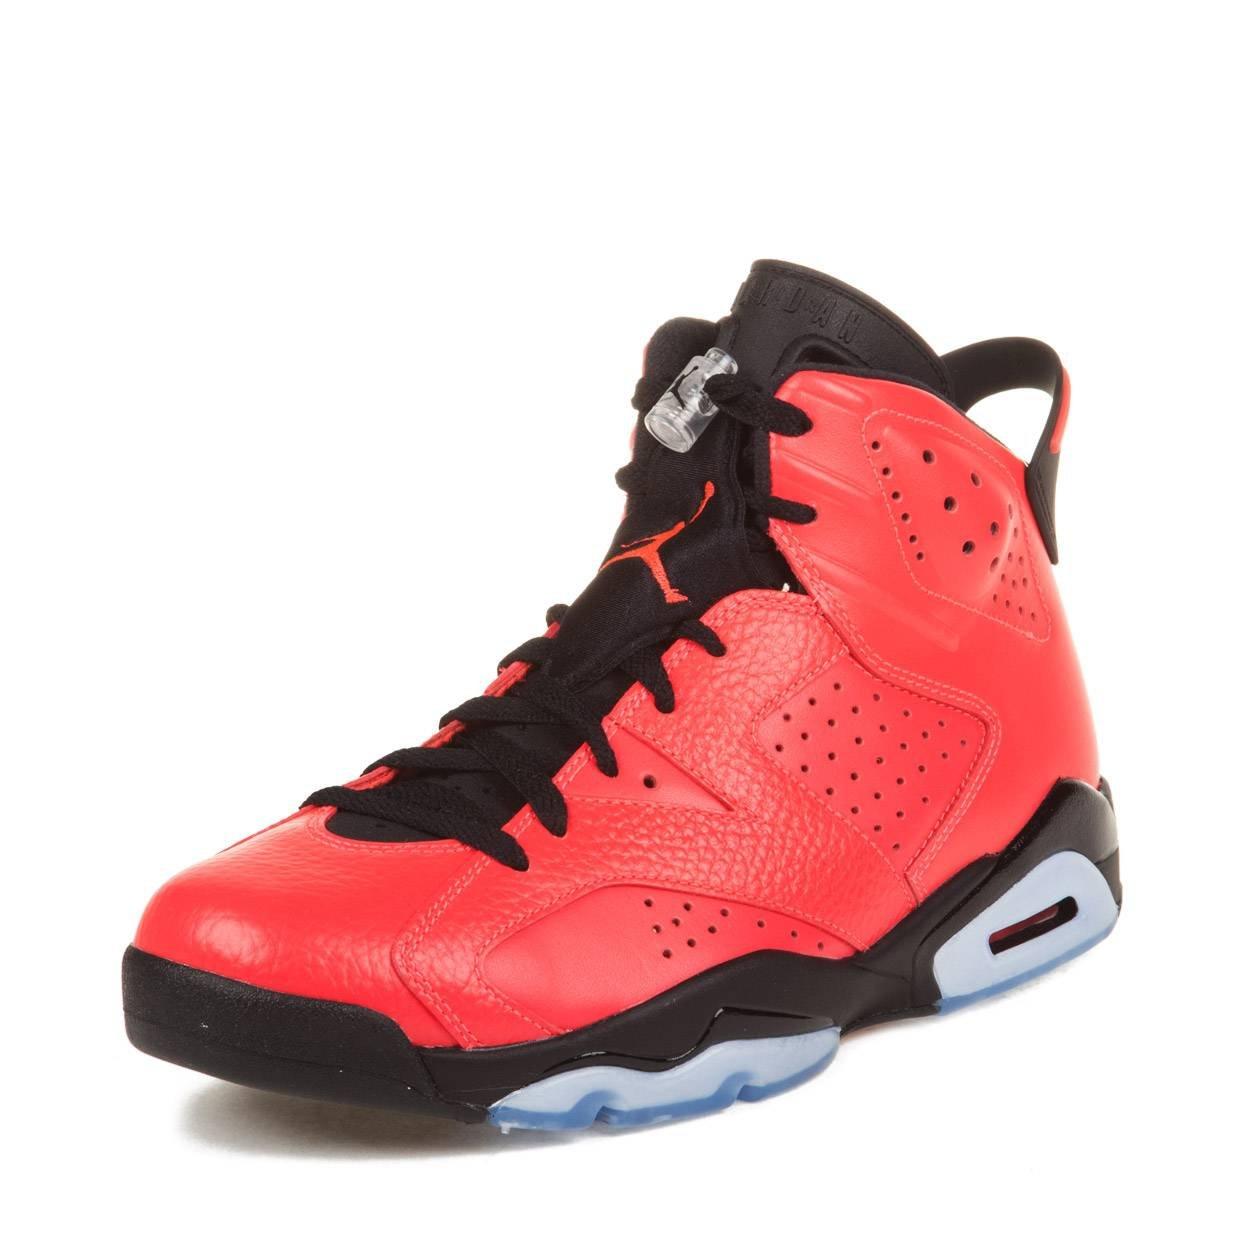 801fe1482f8 Galleon - Nike Mens Air Jordan 6 Retro Toro Infrared 23-Black Leather  Basketball Shoes Size 9.5